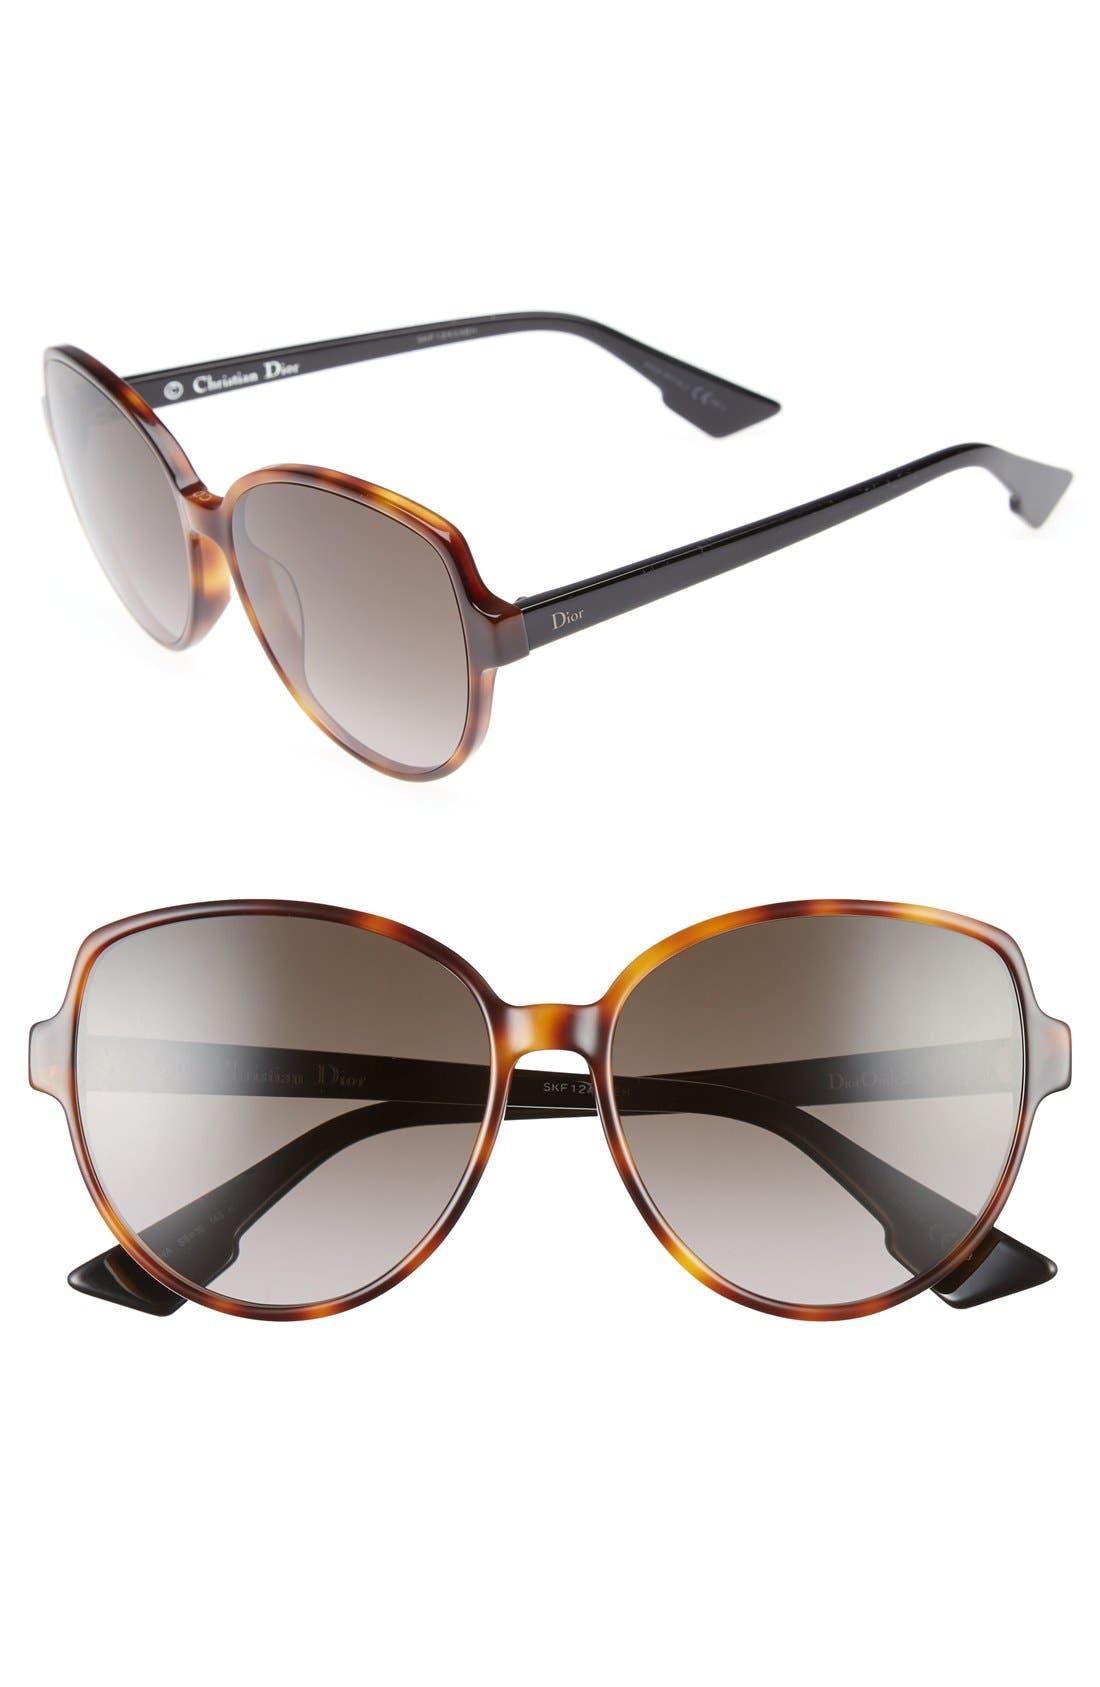 Onde 2 58mm Sunglasses,                             Main thumbnail 1, color,                             Dark Havana/ Black